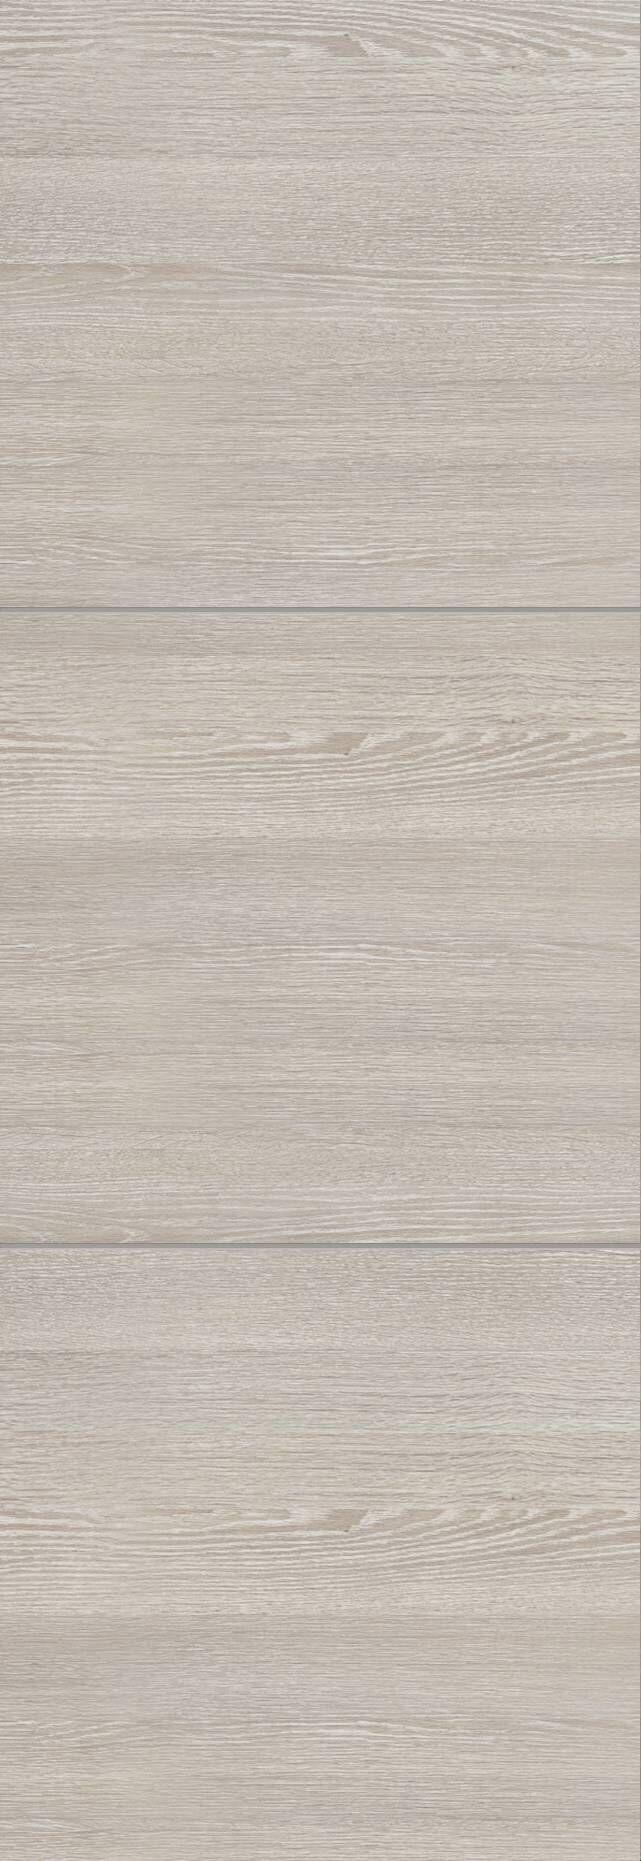 Tivoli В-2 Invisible цвет - Серый дуб Без стекла (ДГ)